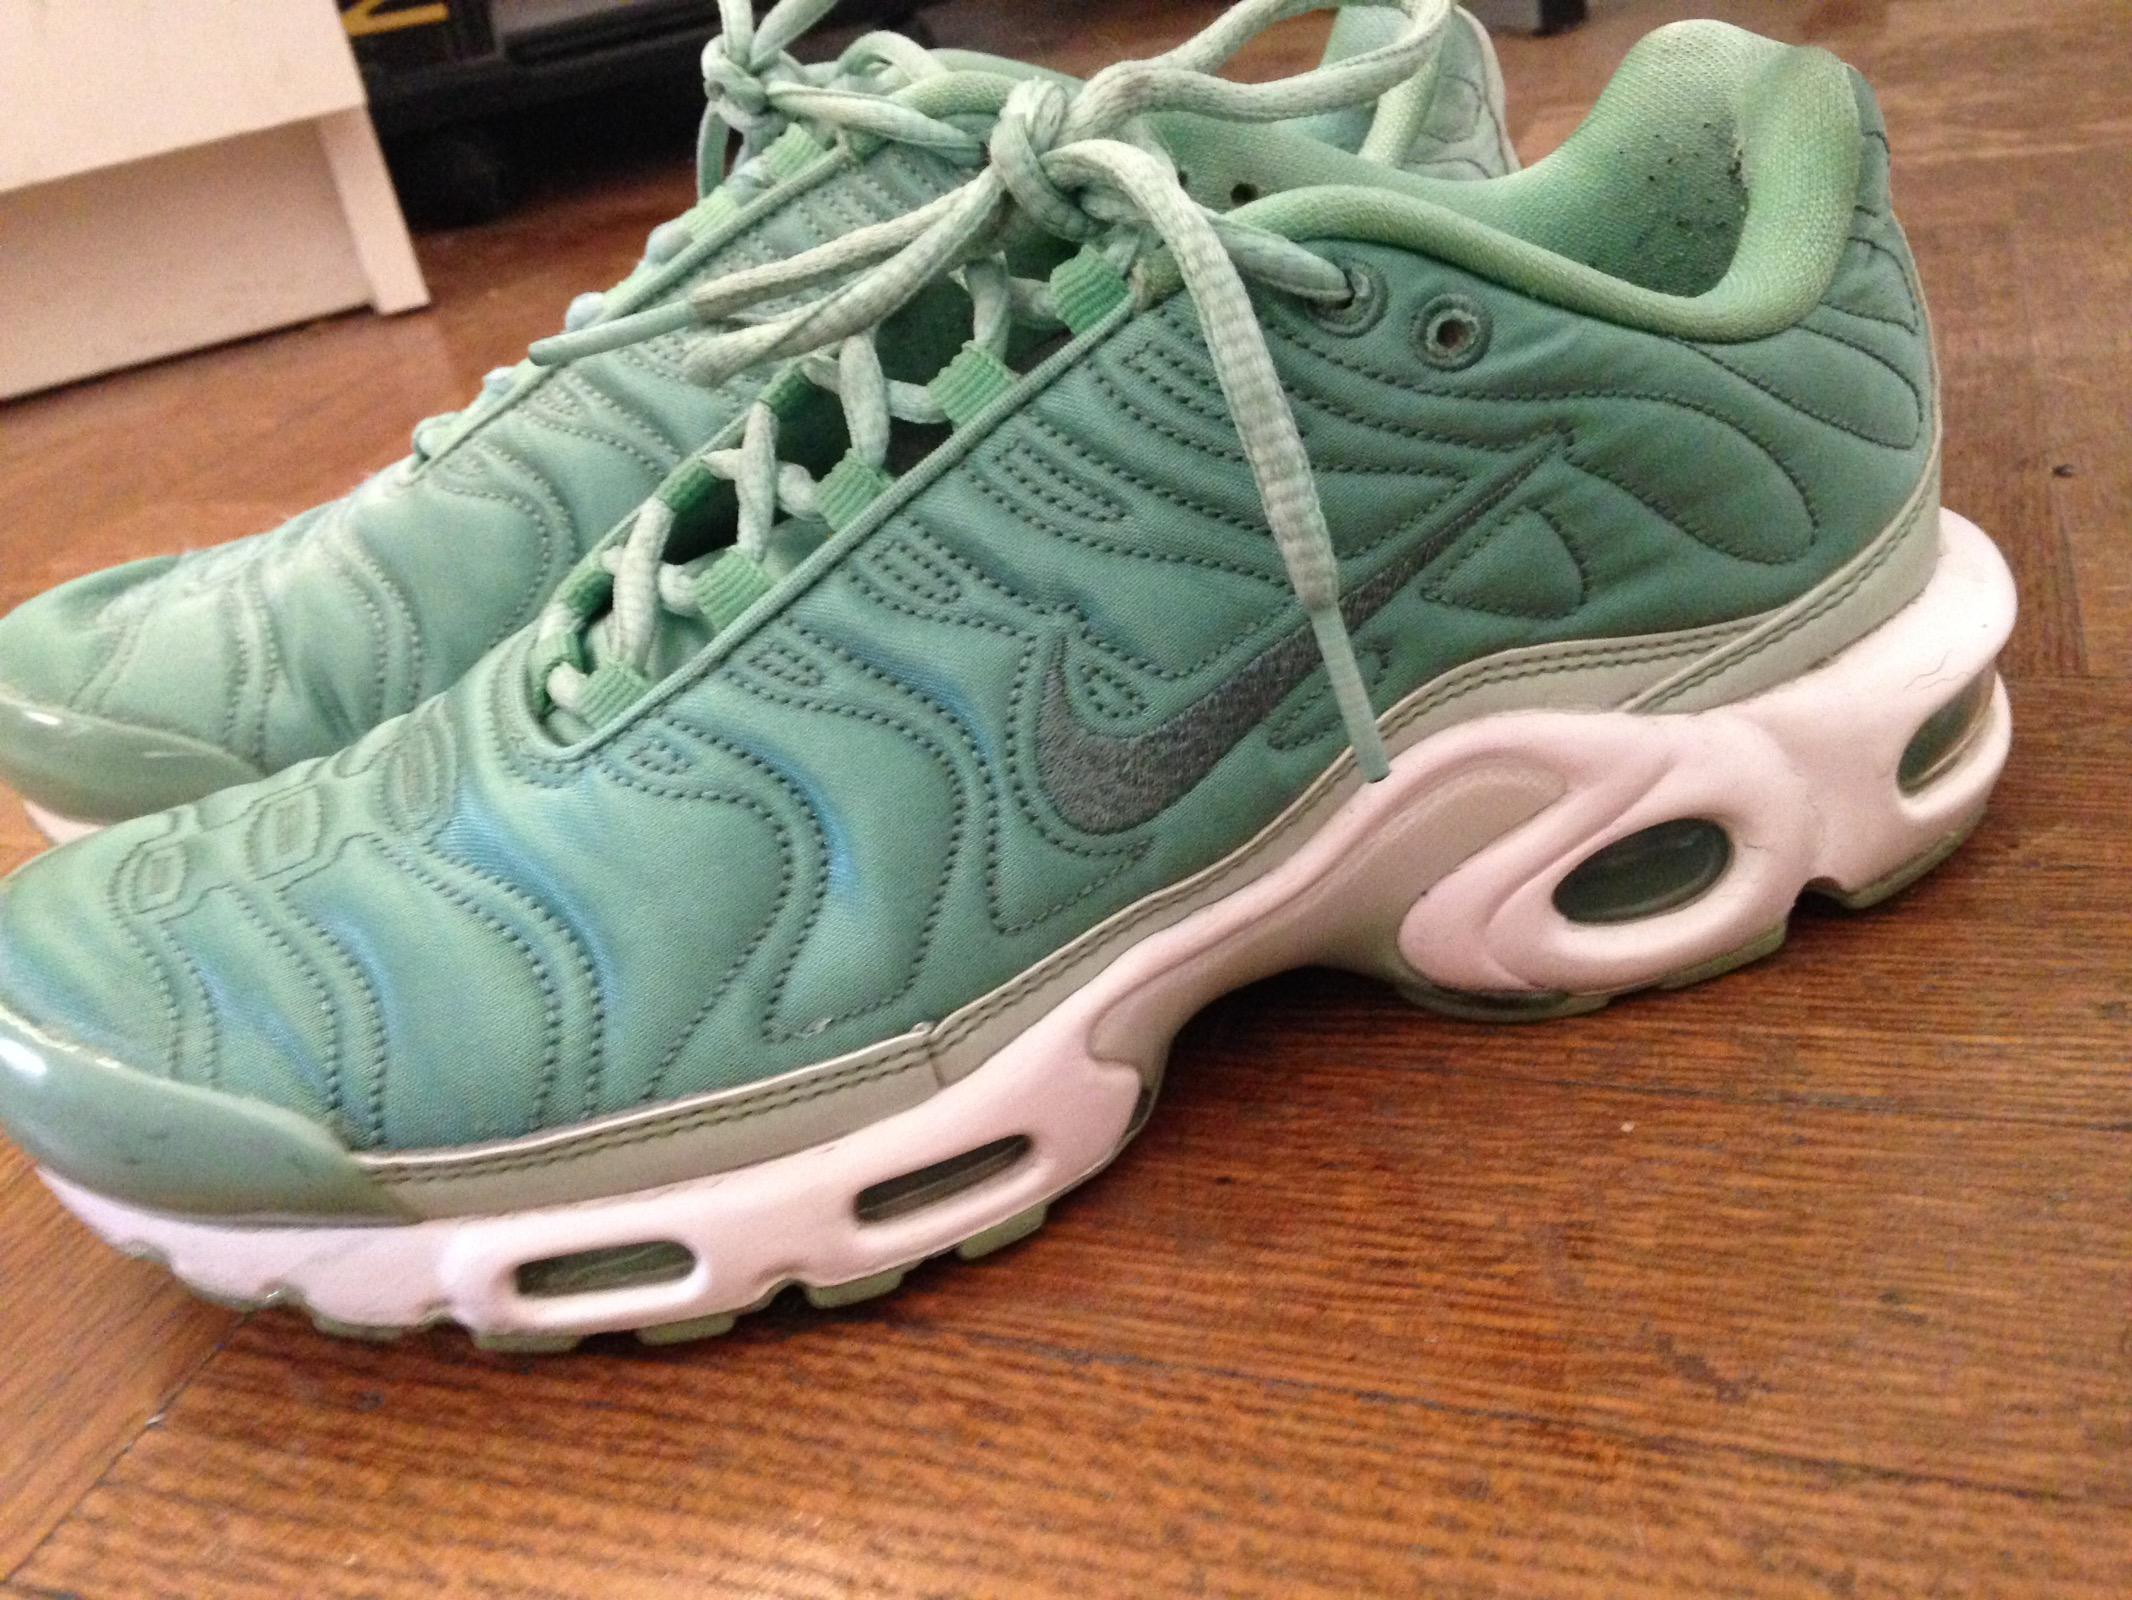 Nike Nike Tn Satin Turquoise | Grailed